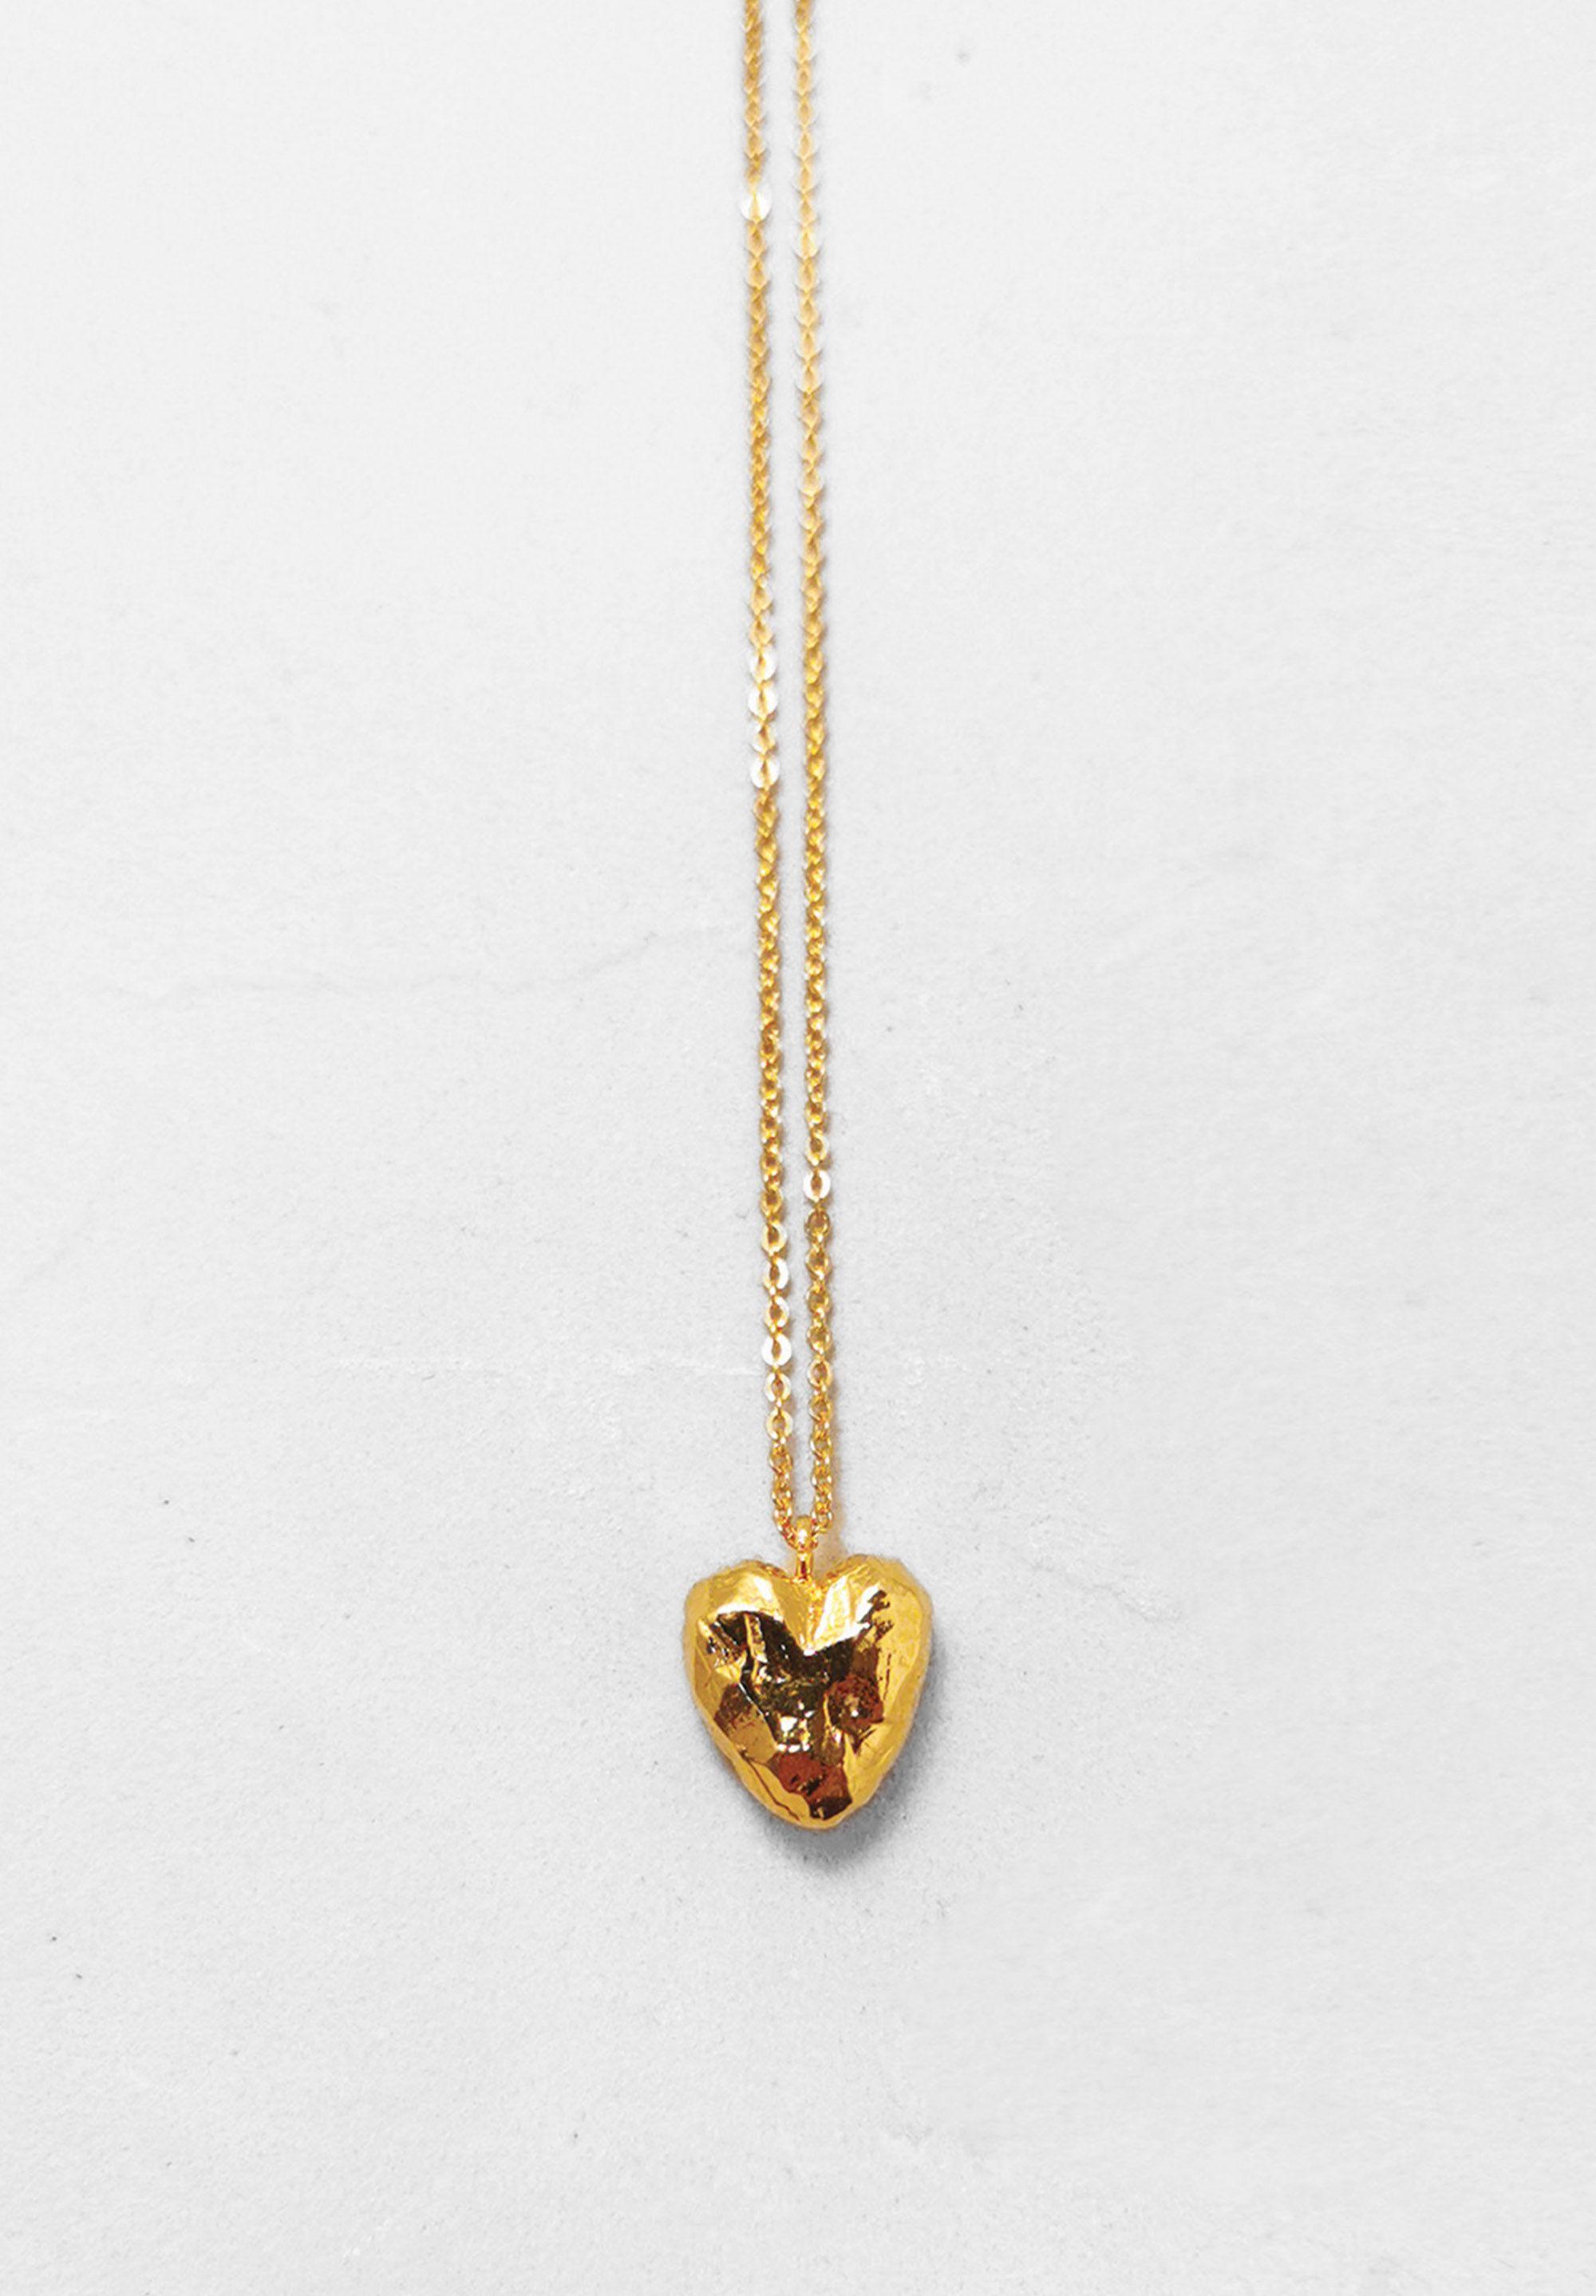 Collier Hory Gold   Elise Tsikis Paris   Bijoux   Story Shop   Face to Face